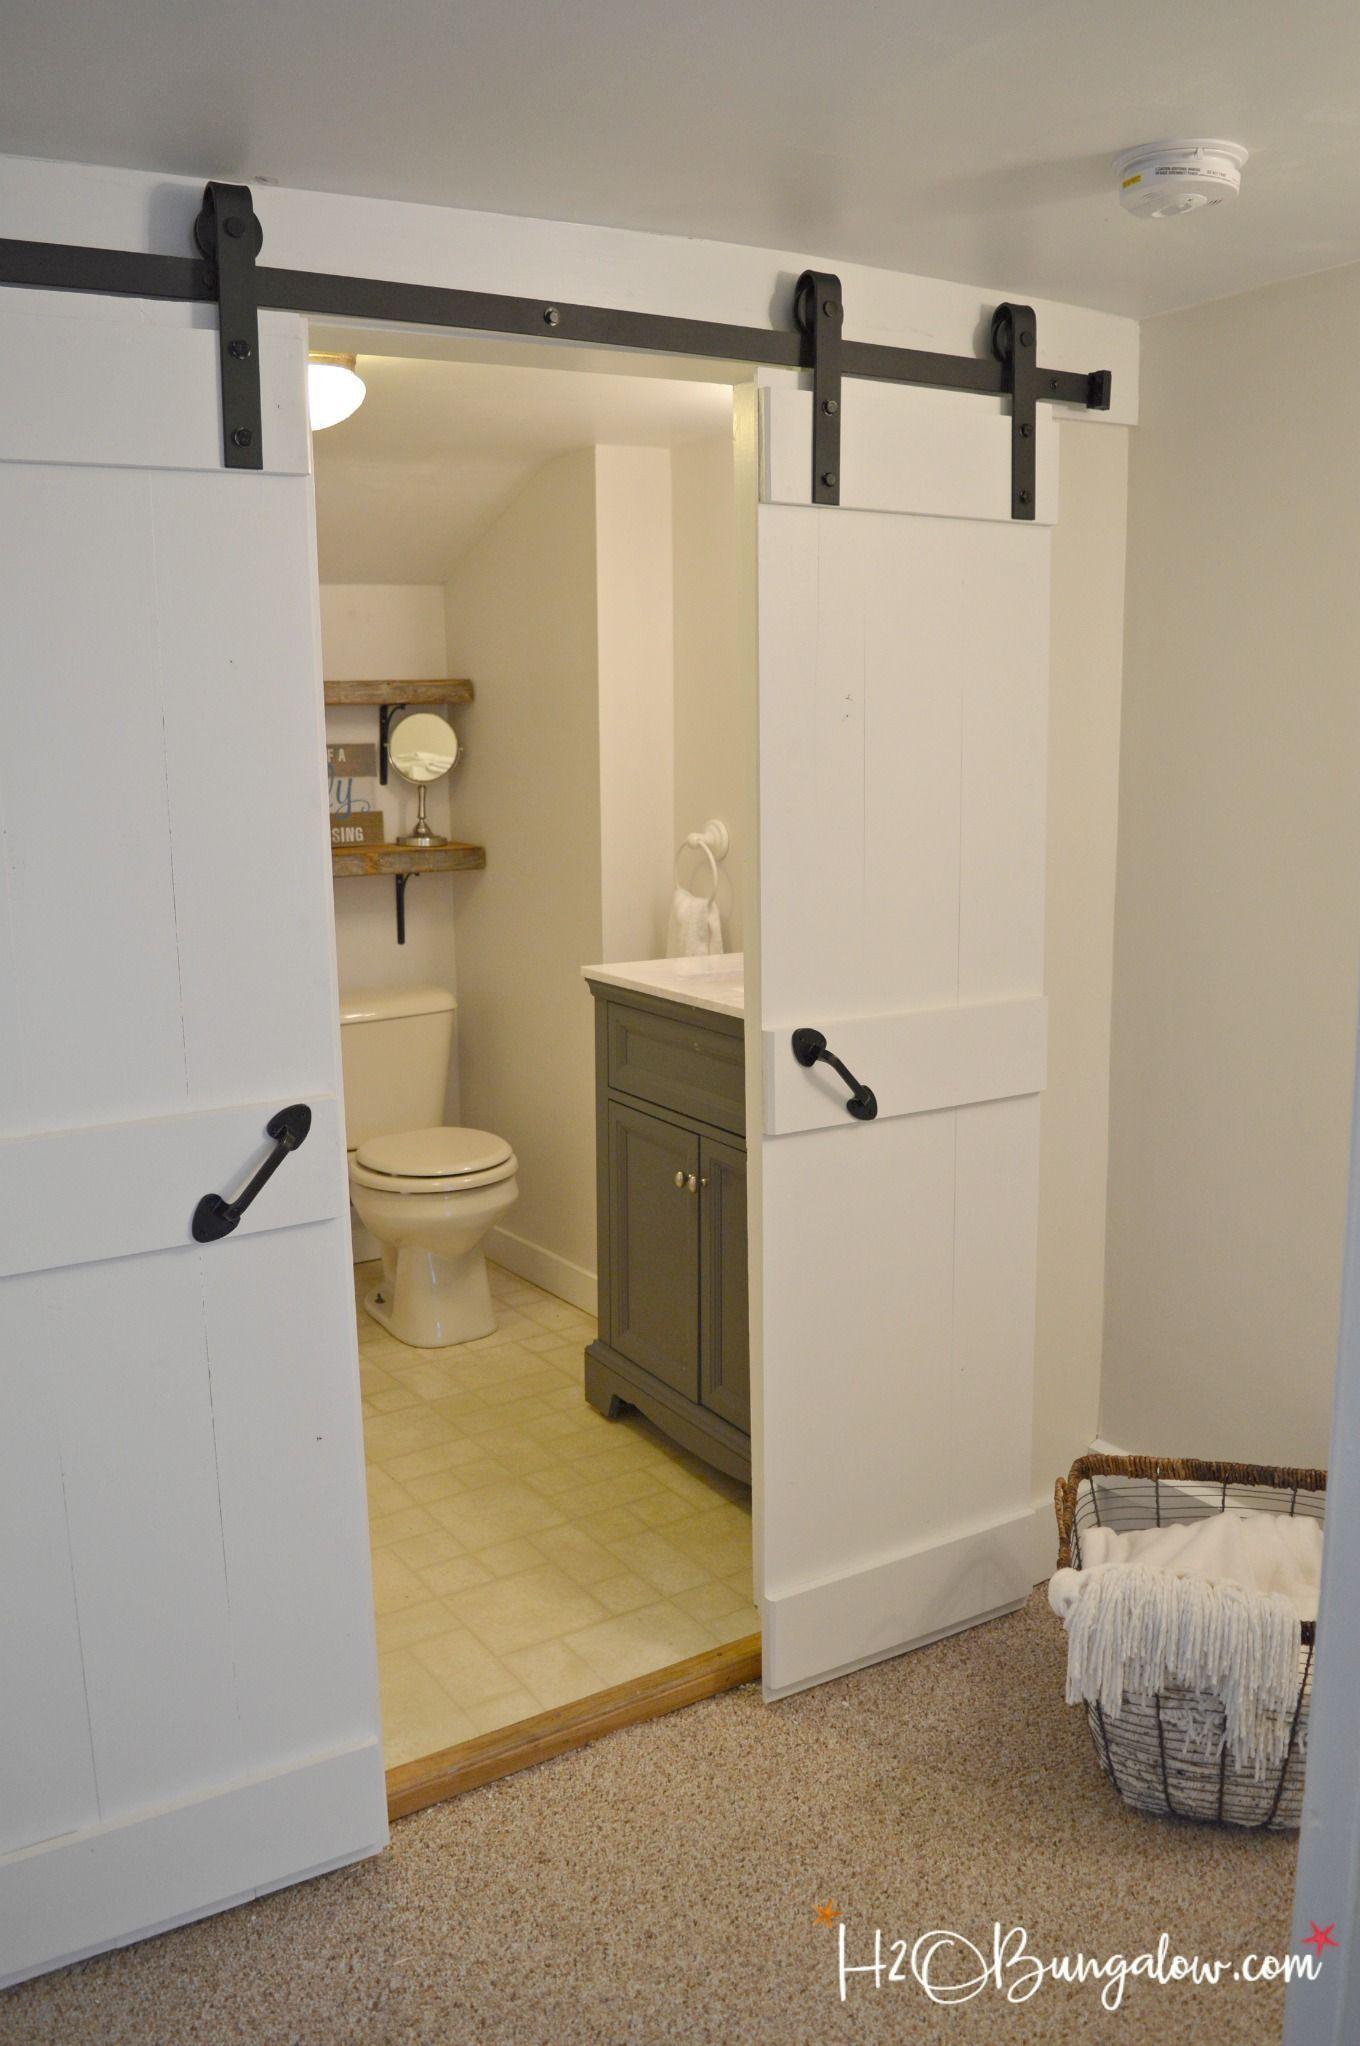 Easy Diy Double Barn Door Tutorial For Interior Sliding Barn Doors